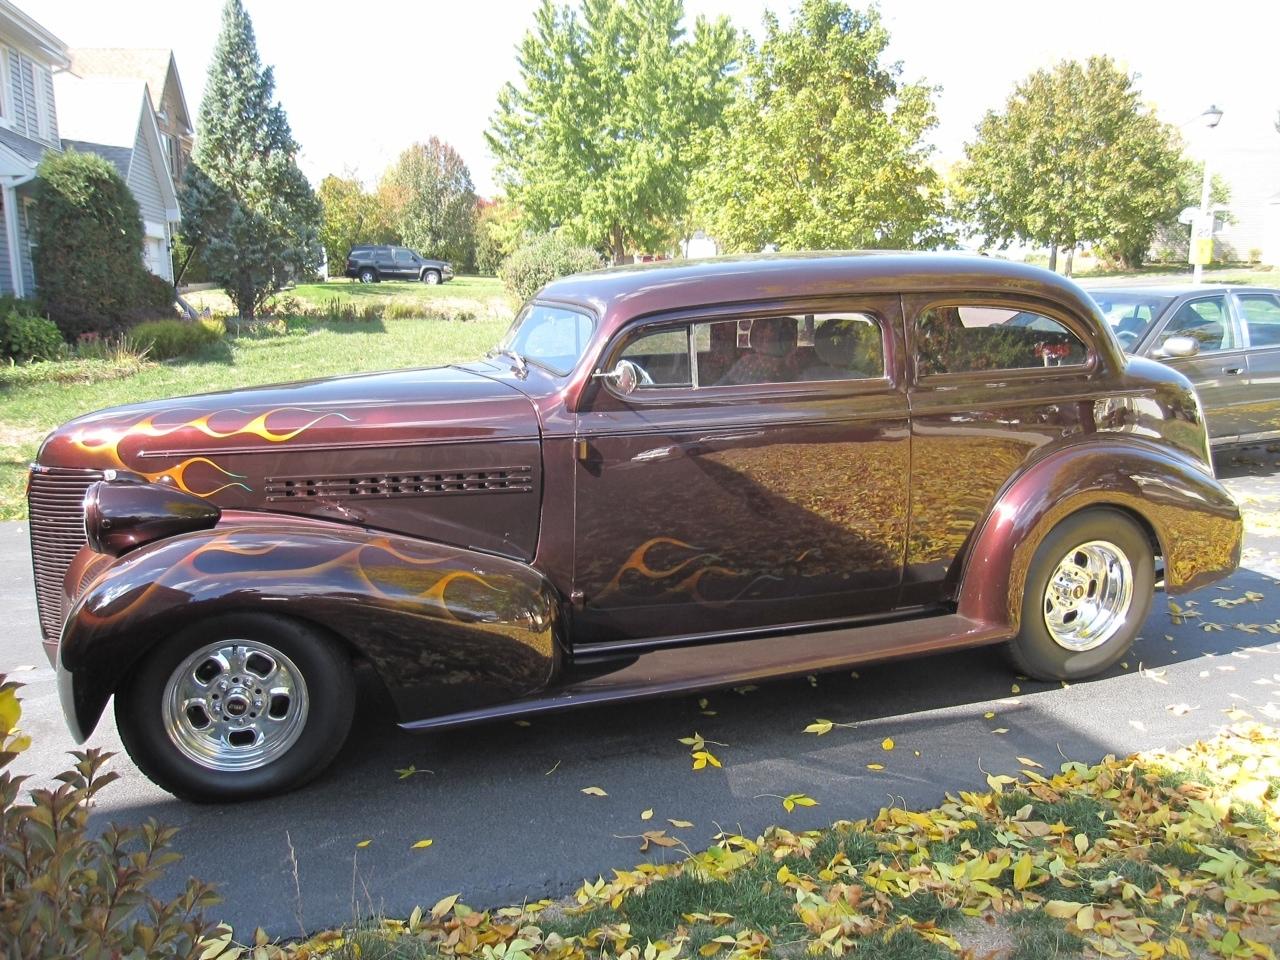 Hot rod inspirations hotrod hotline for 1939 chevy 2 door sedan for sale